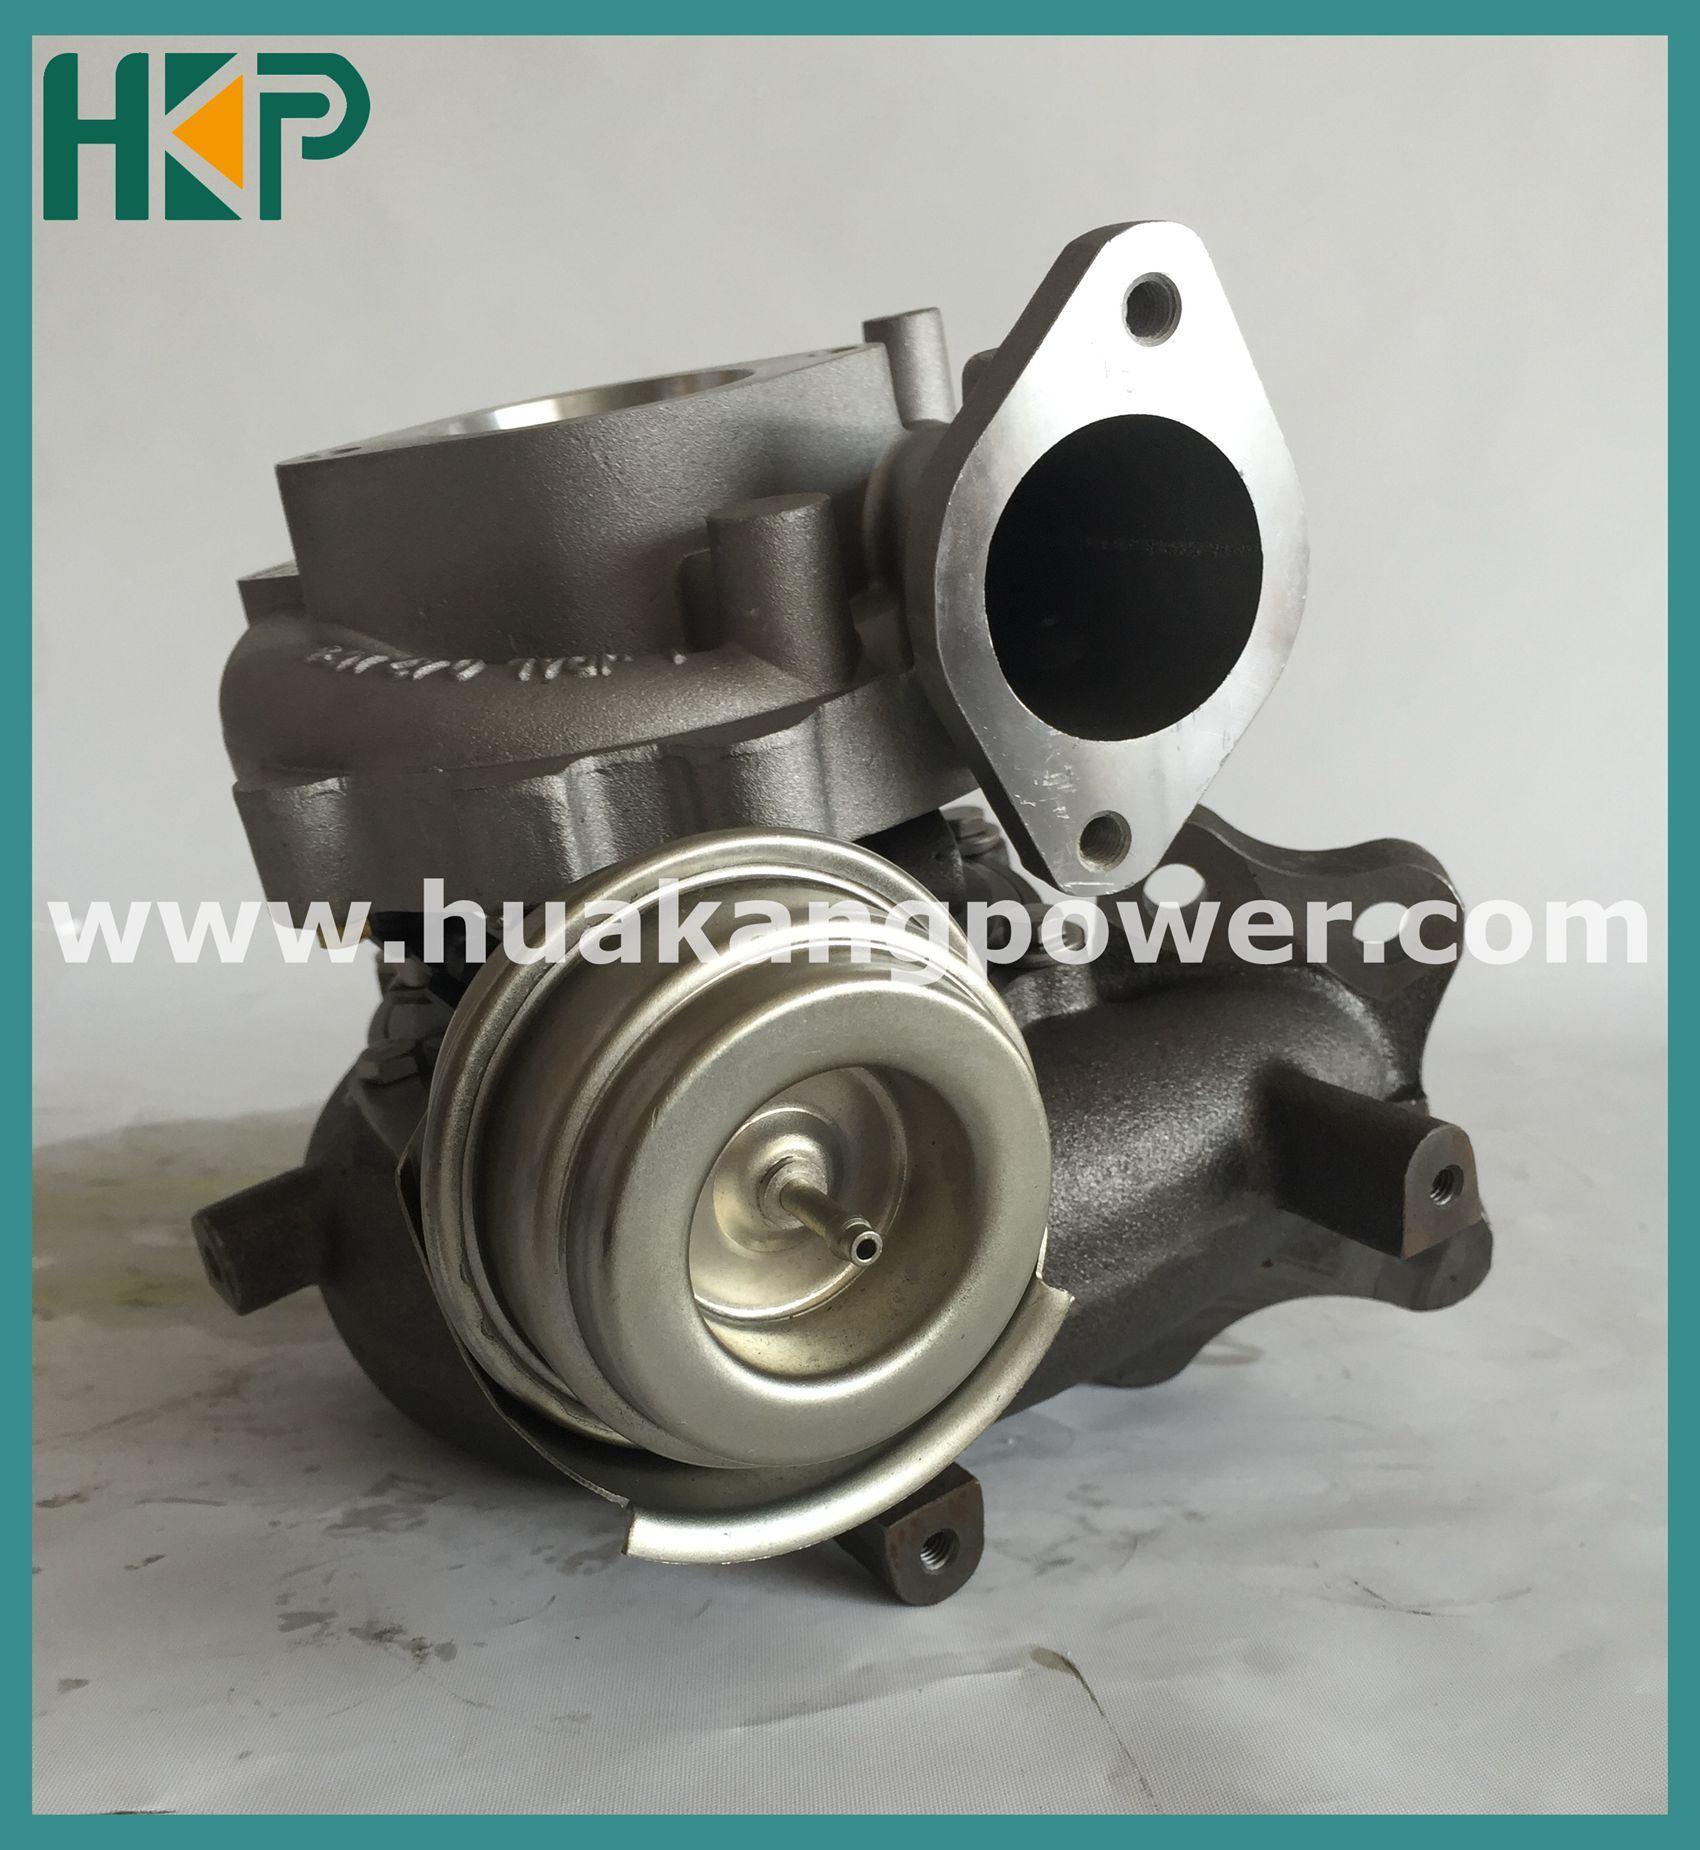 Gt2056V 767720-0004 14411-Eb70A Turbo/Turbocharger